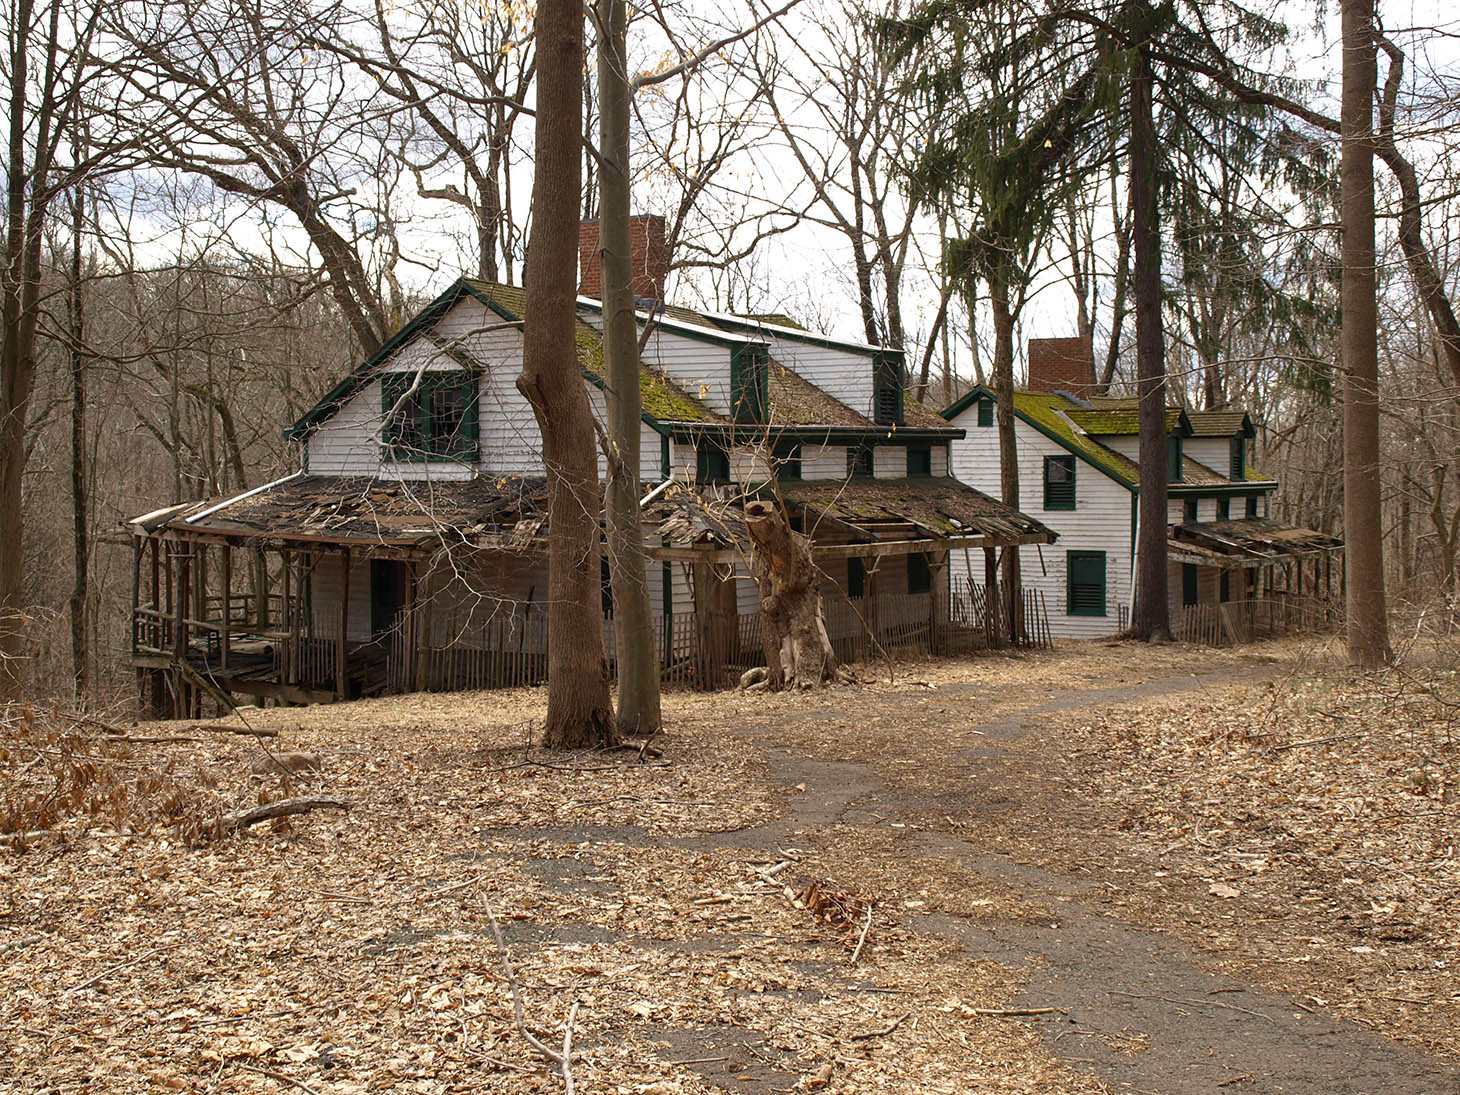 Feltville Ruins